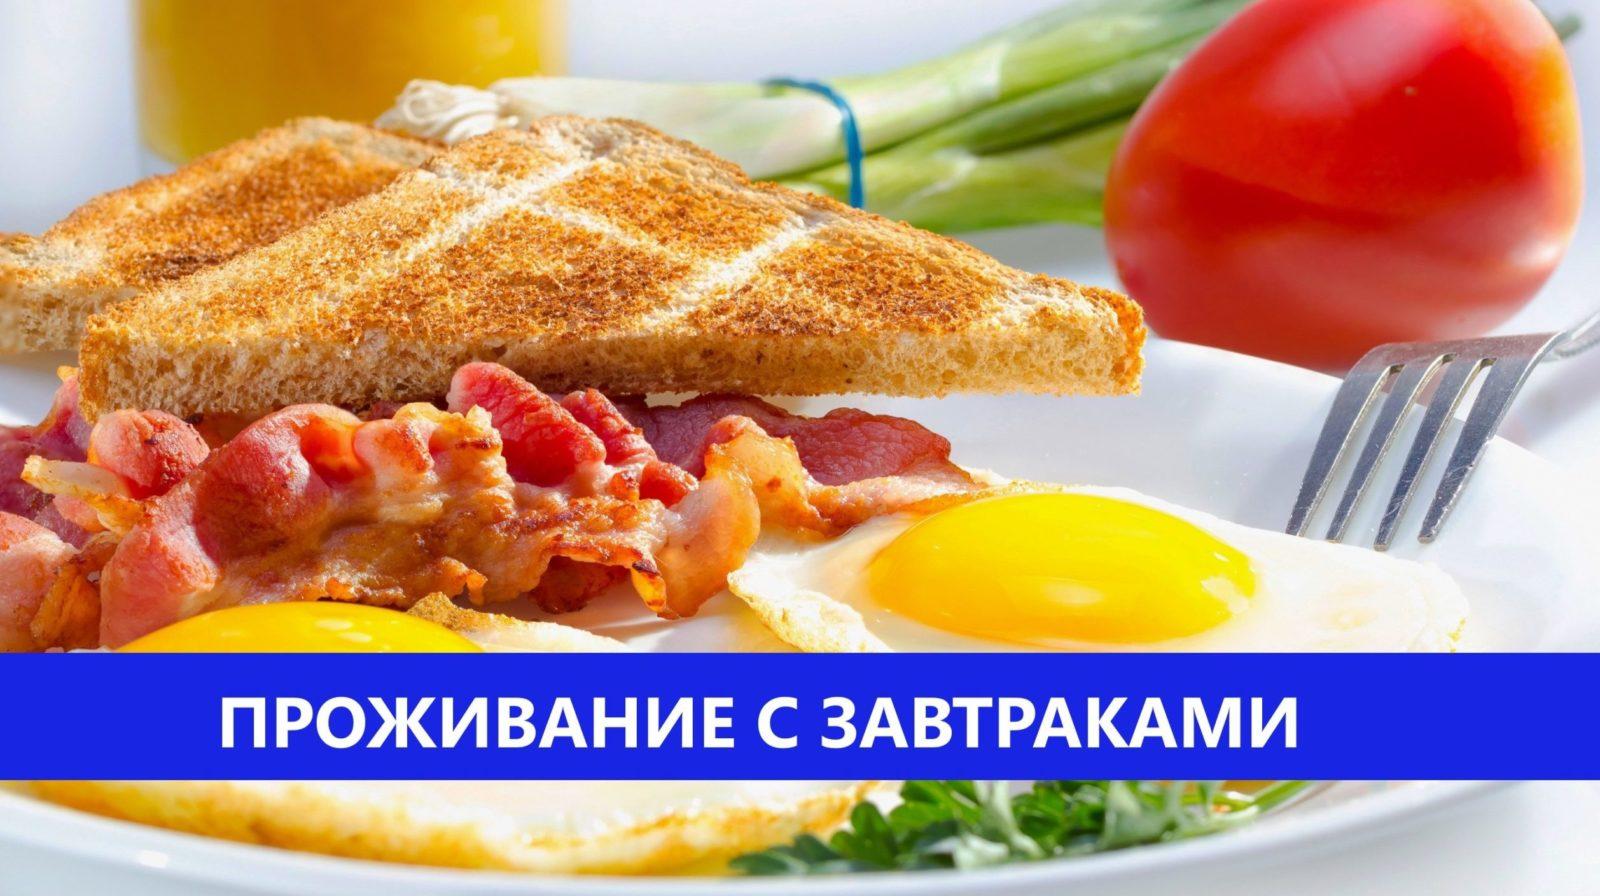 Проживание с завтраком в апартаментах Веста